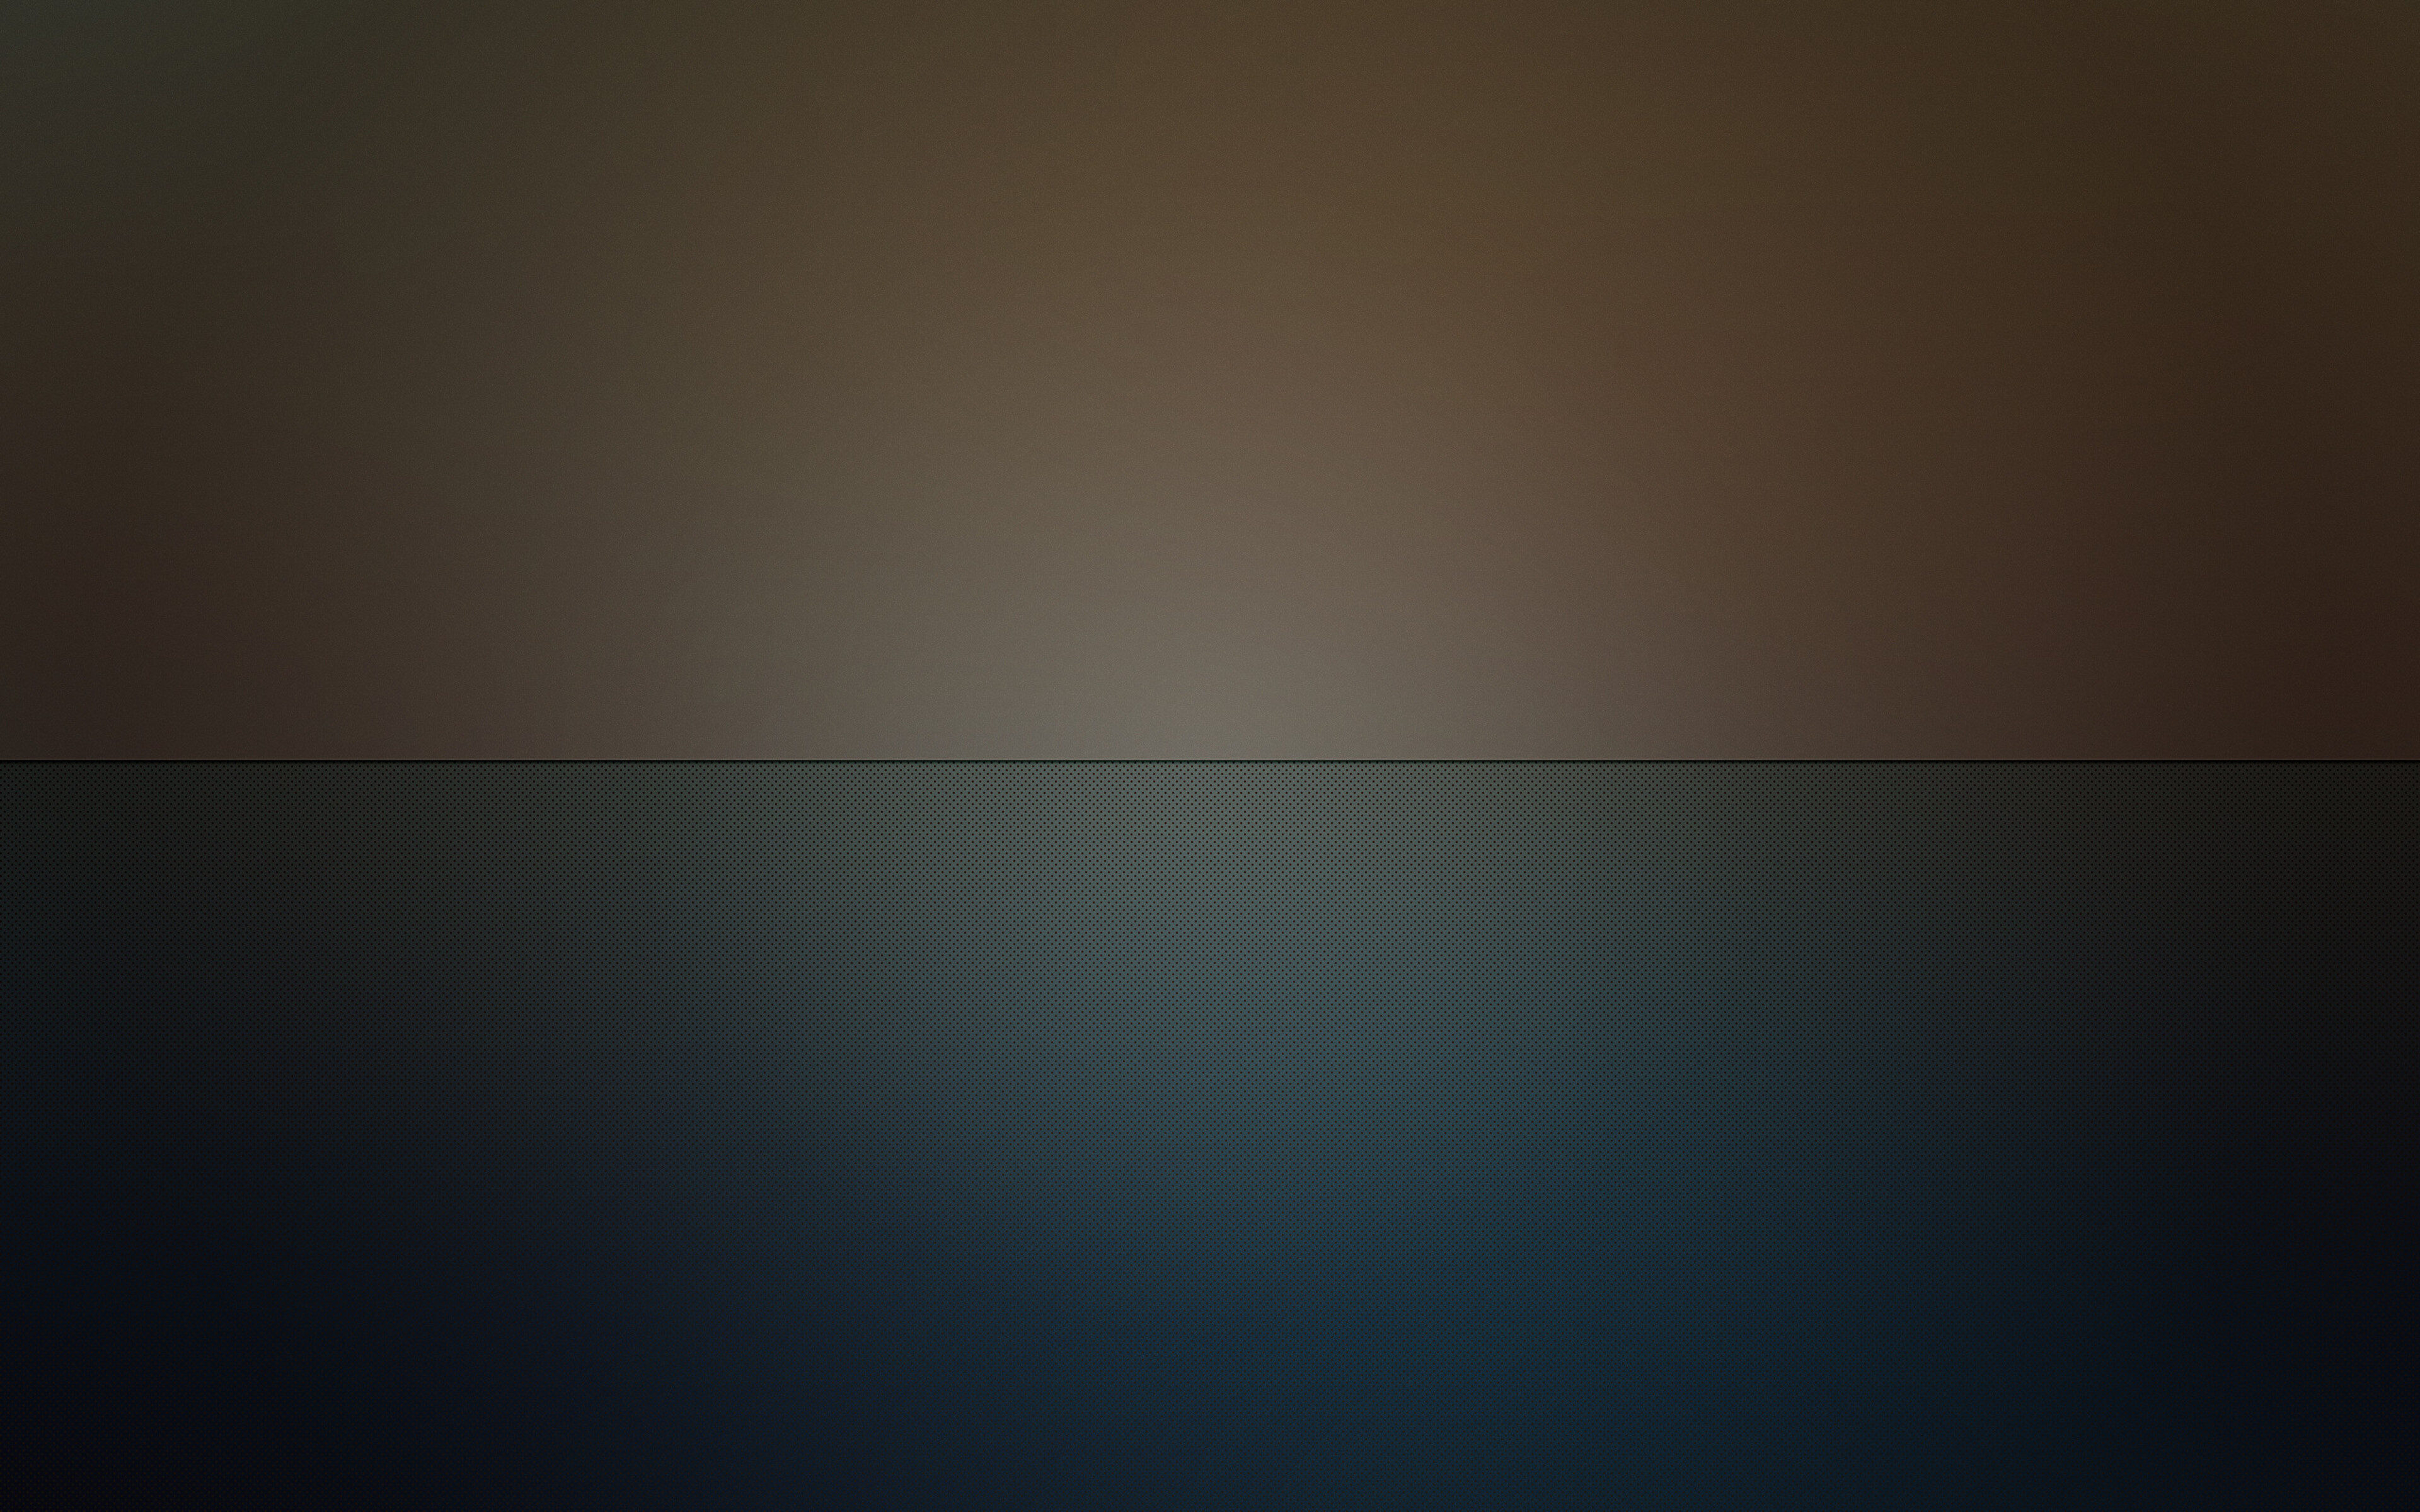 dots-abstract-qy.jpg